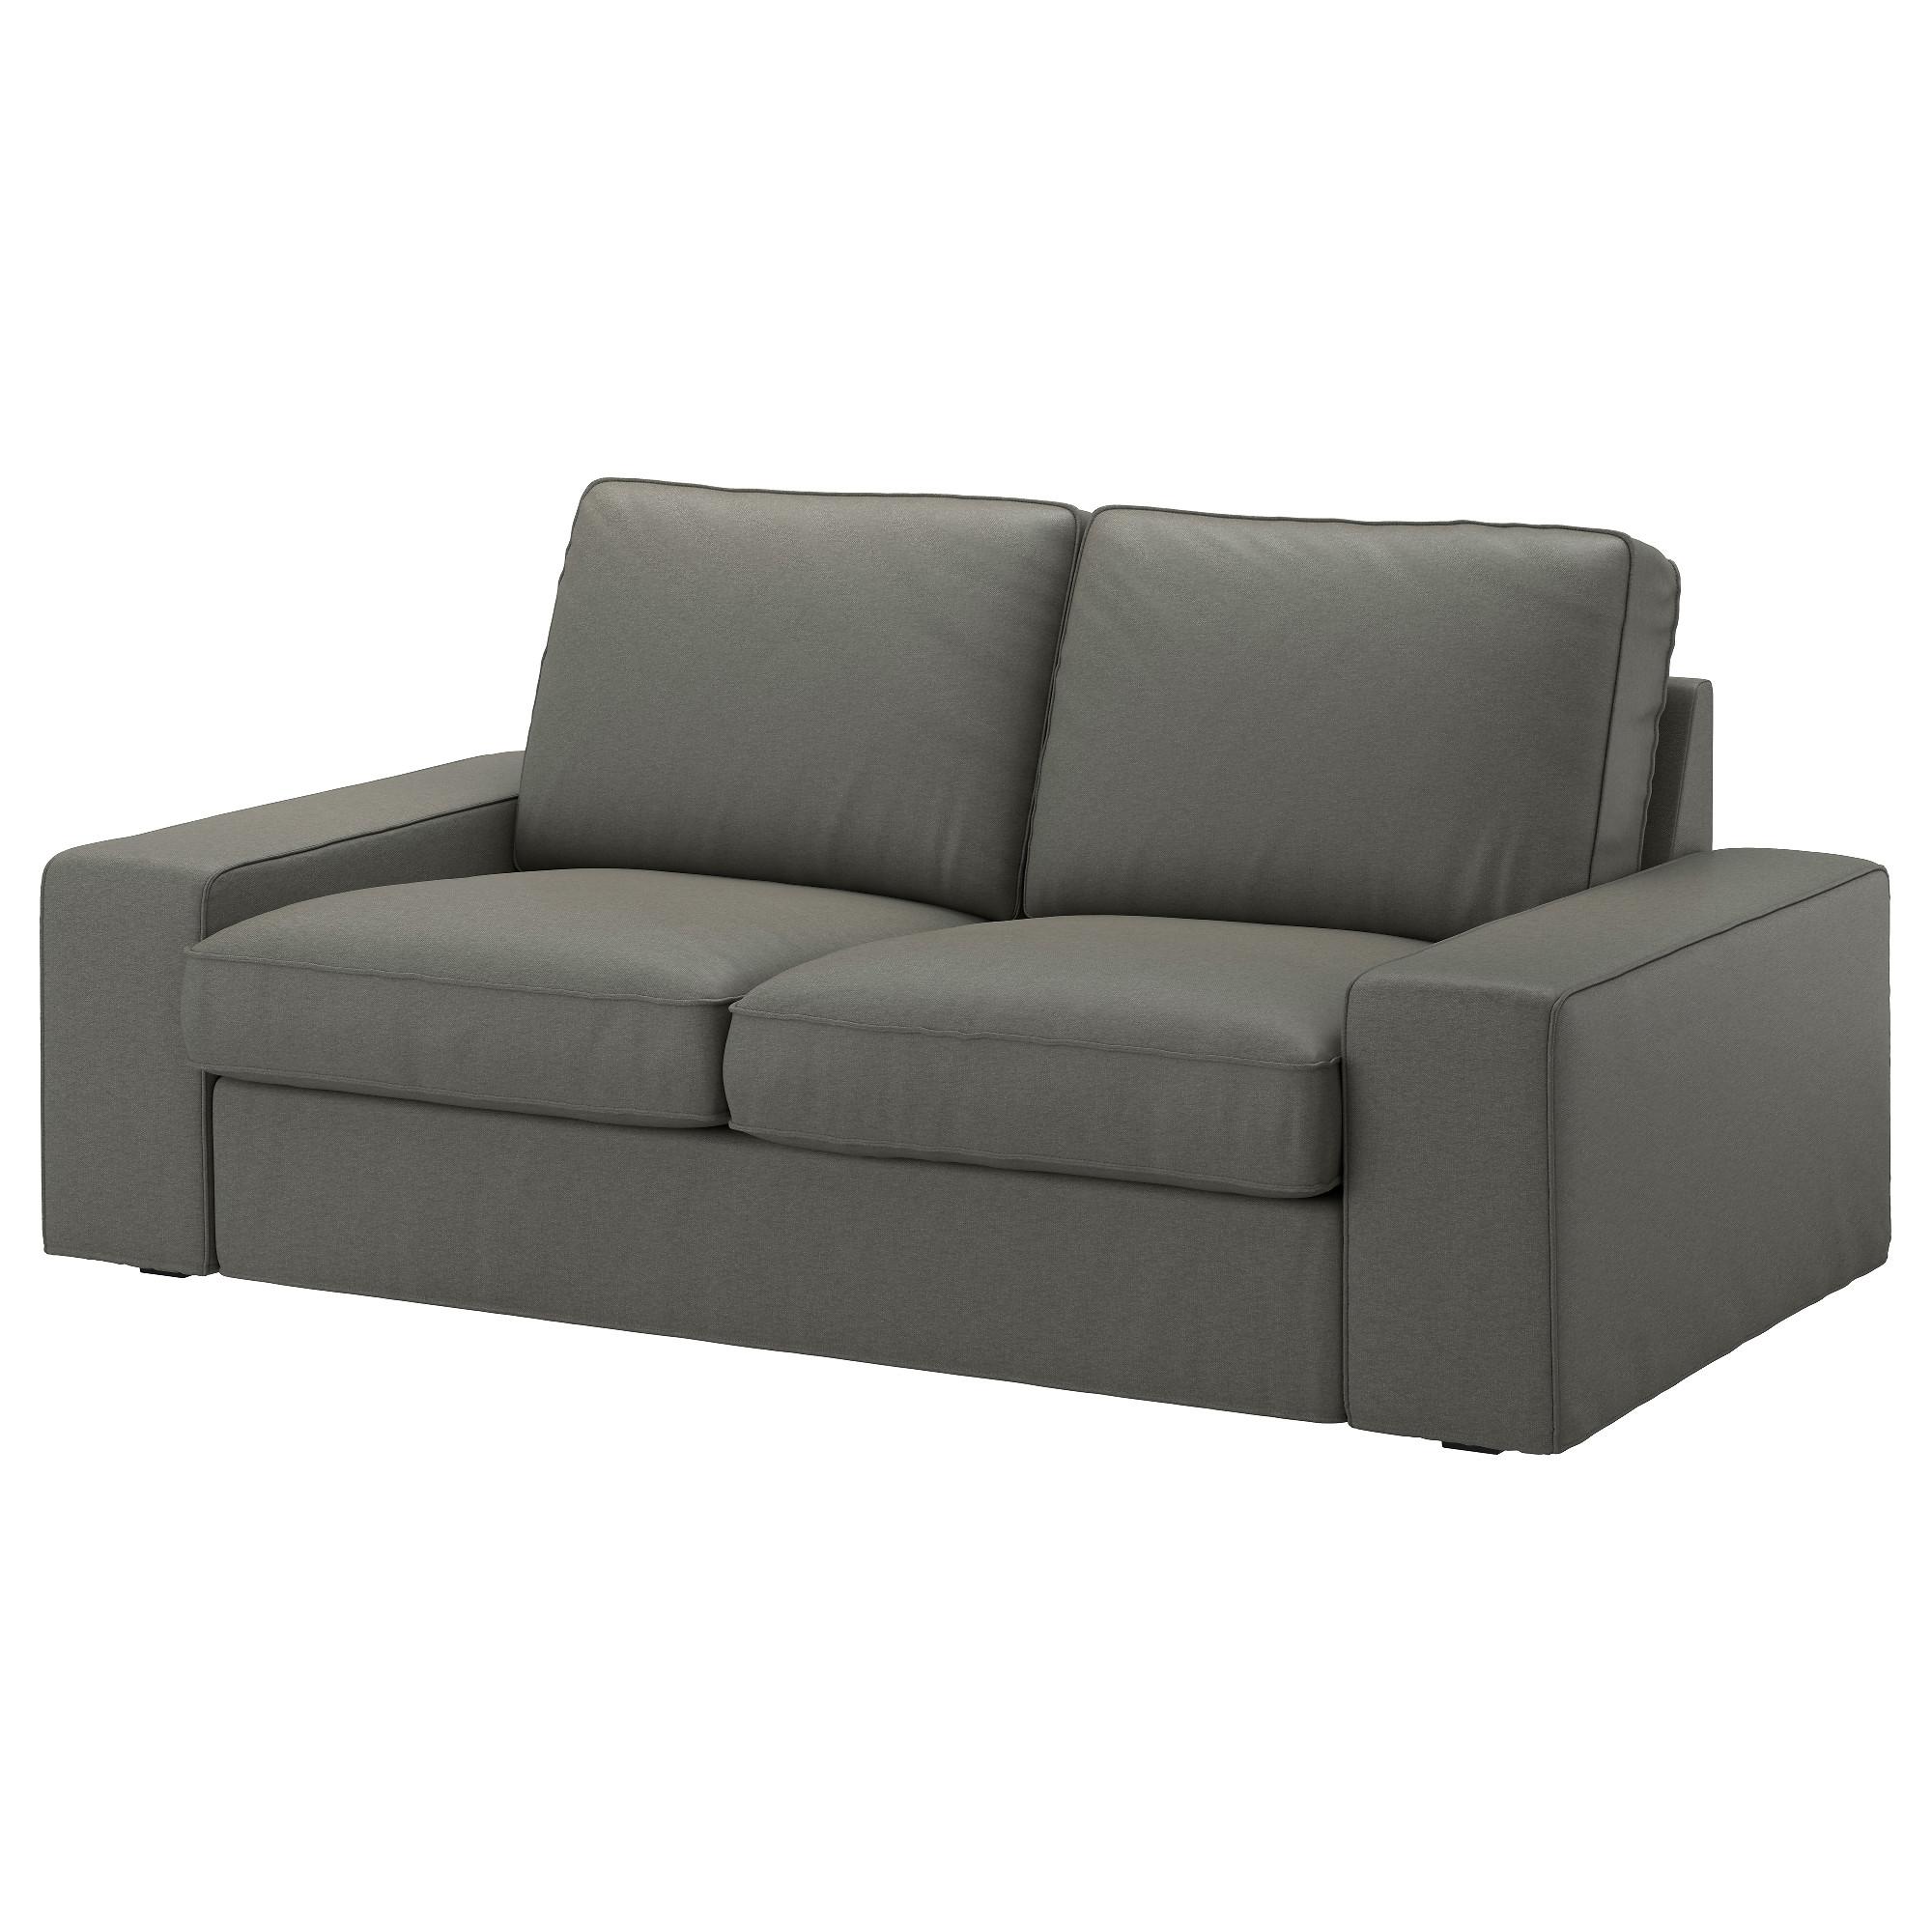 KIVIK sofá 2 plazas con funda BORRED verde grisáceo